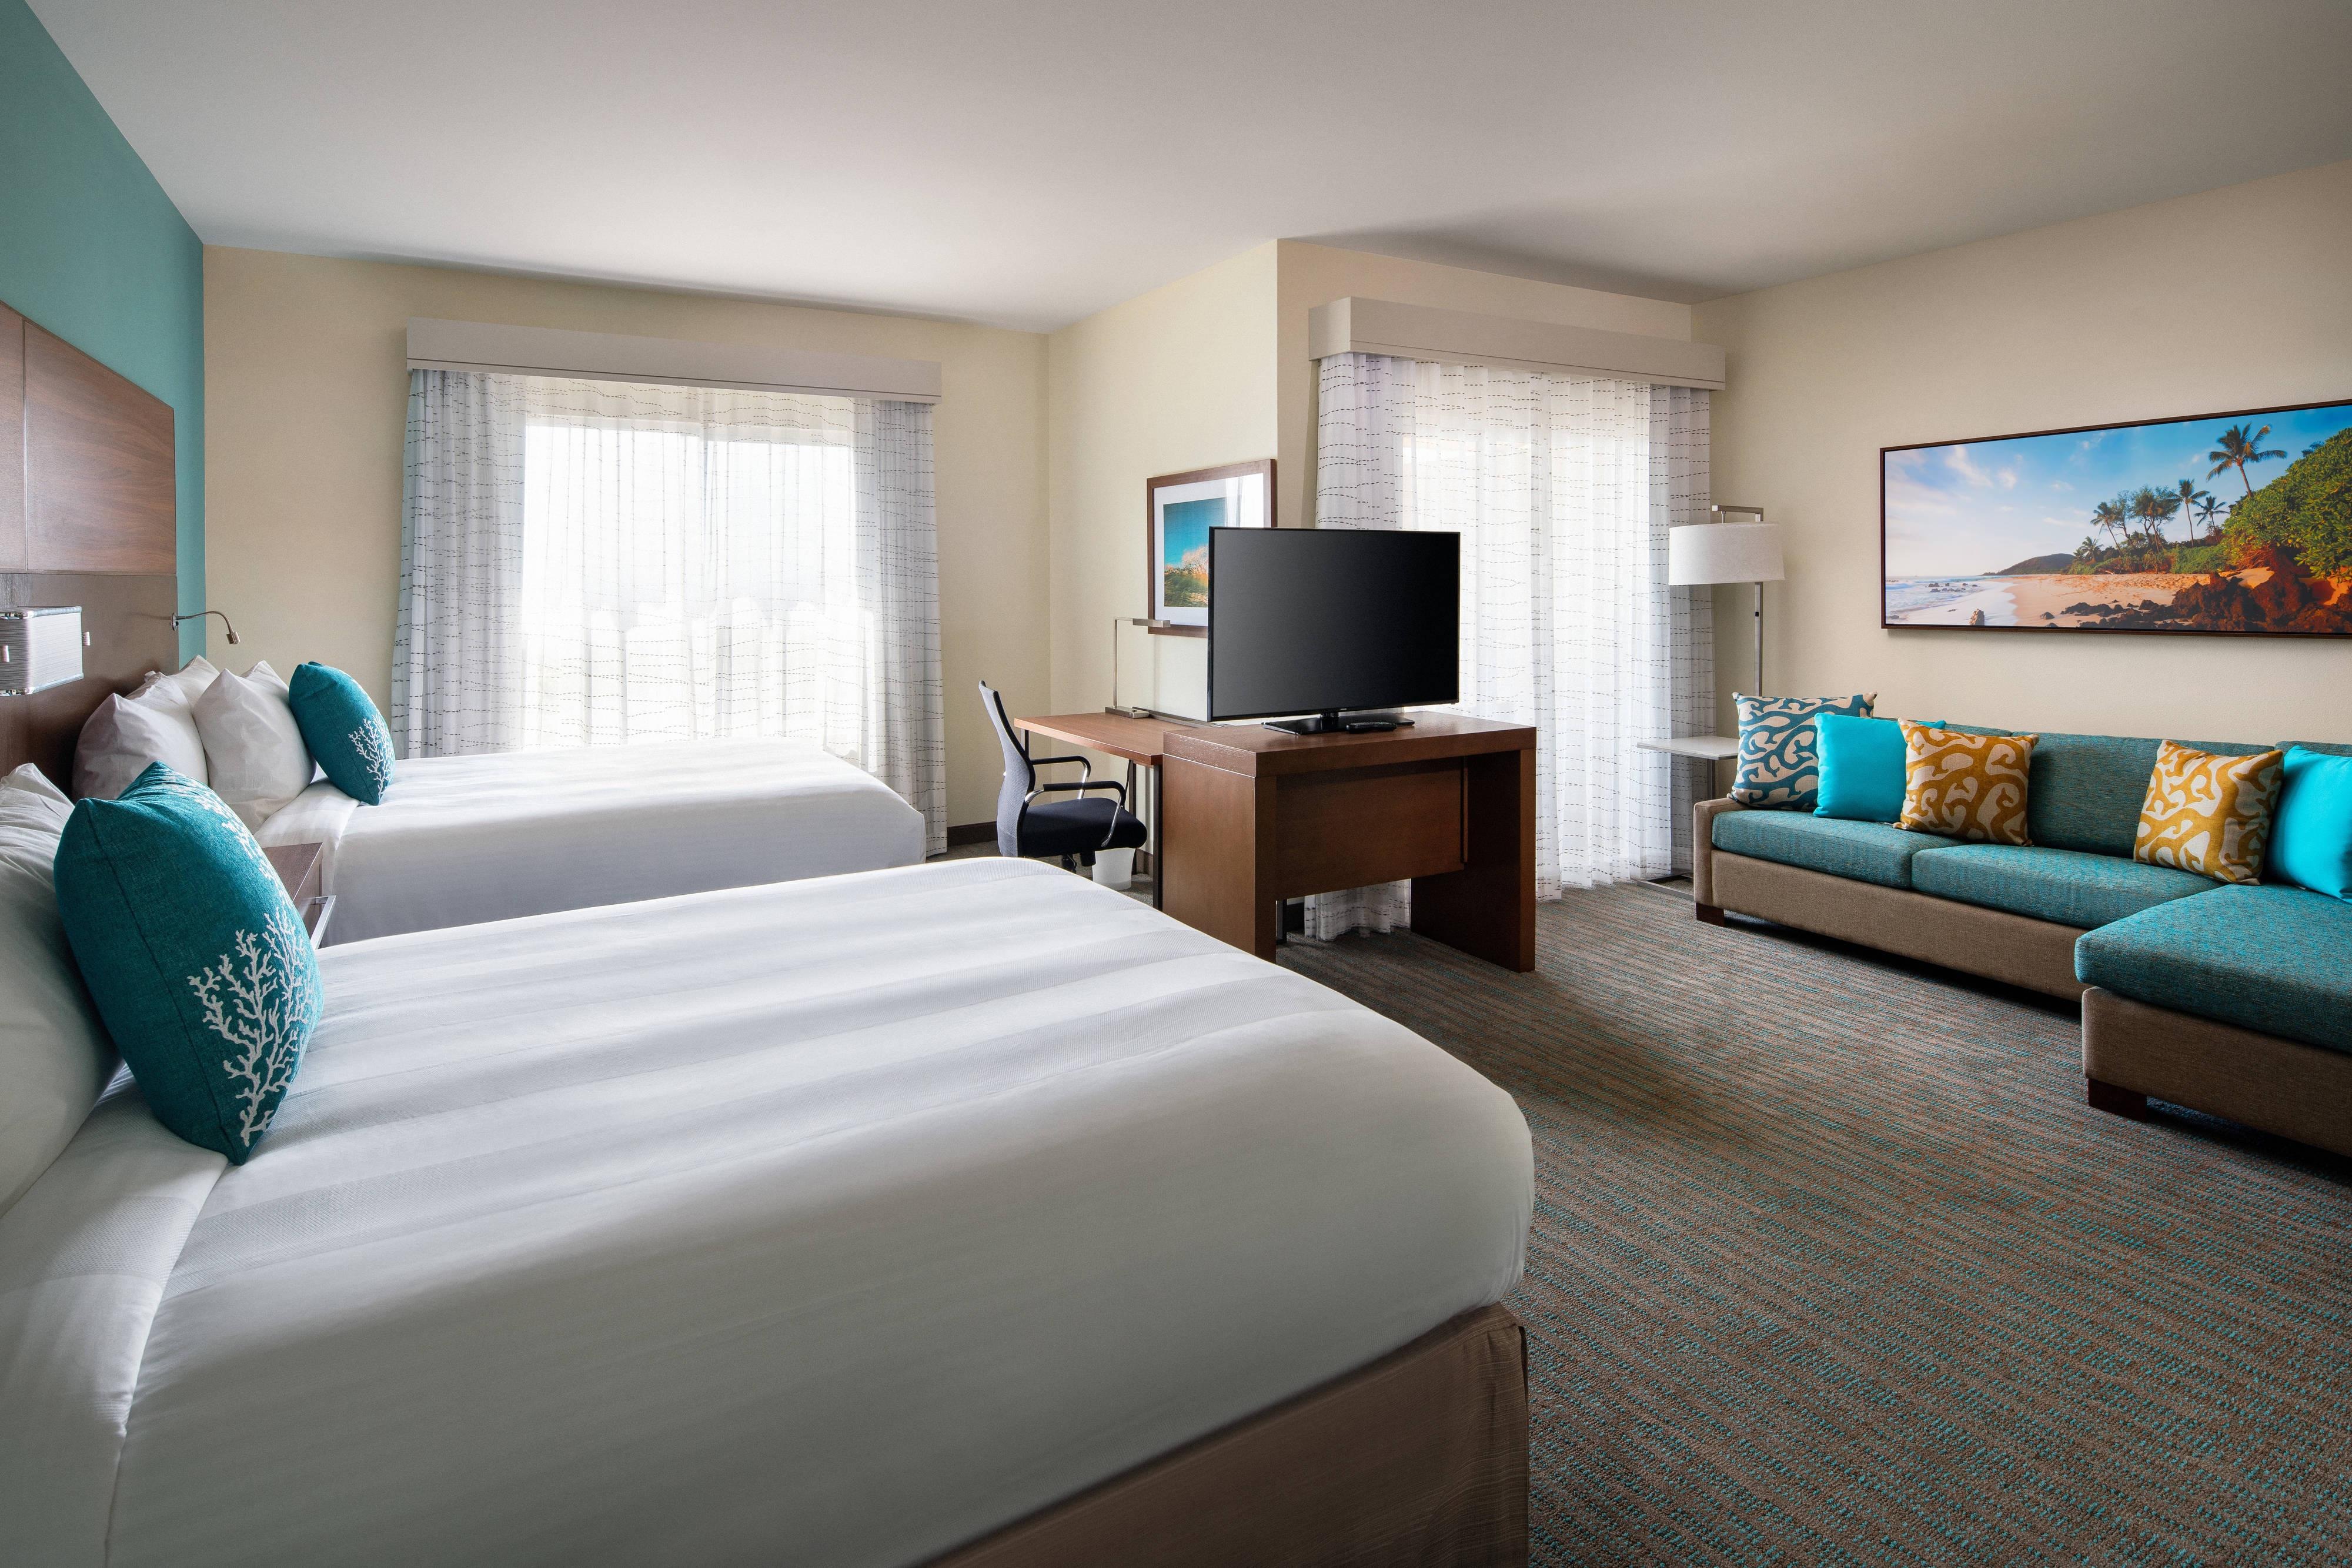 Extended Stay Maui Hotels In Wailea Hawaii Residence Inn Maui Wailea